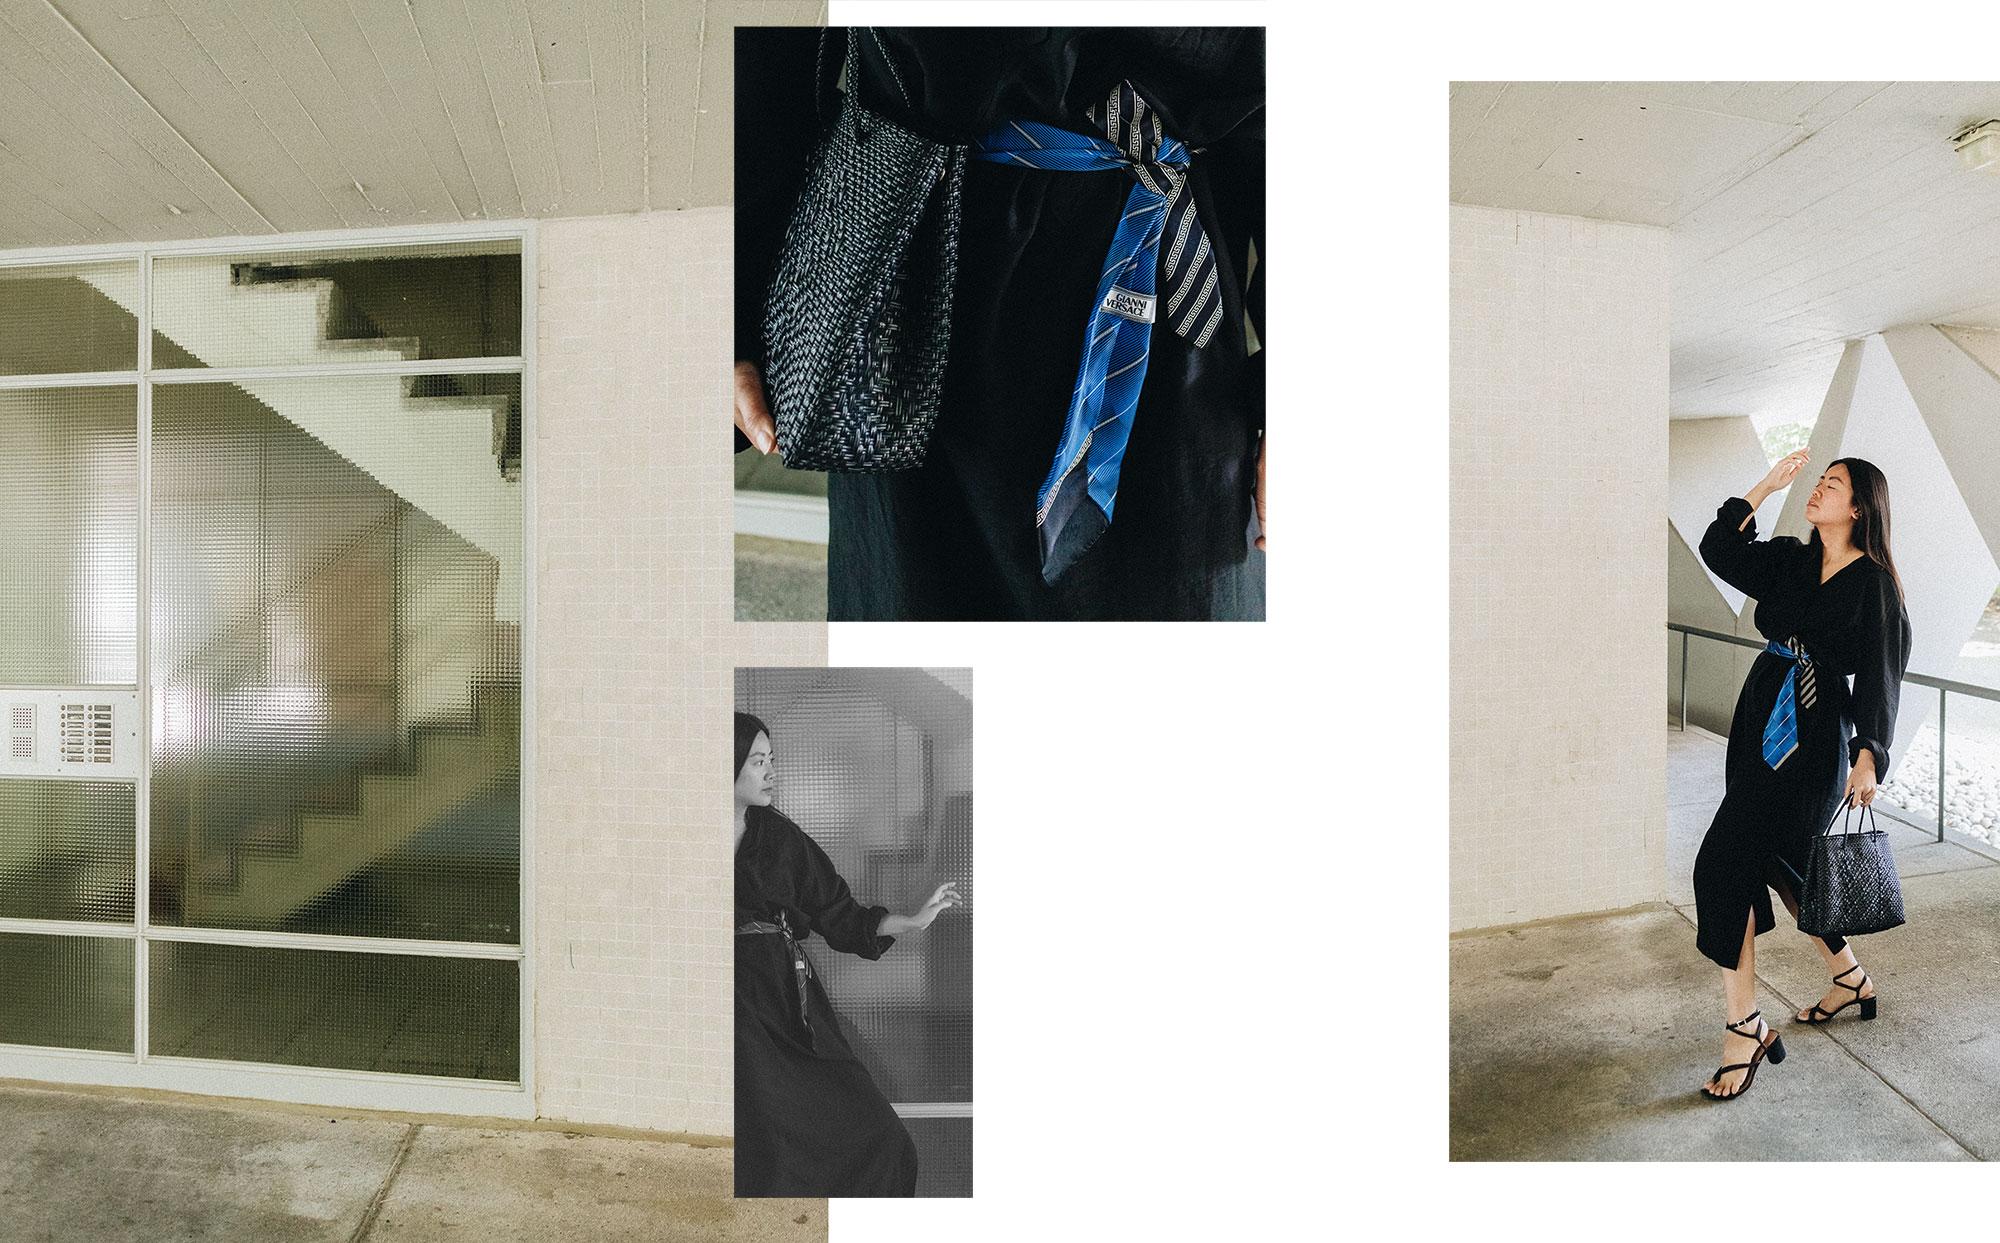 ARKET Dress & Ganni Versace Vintage Tie / iHeartAlice.com - Lifestyle, Travel & Fashionblog